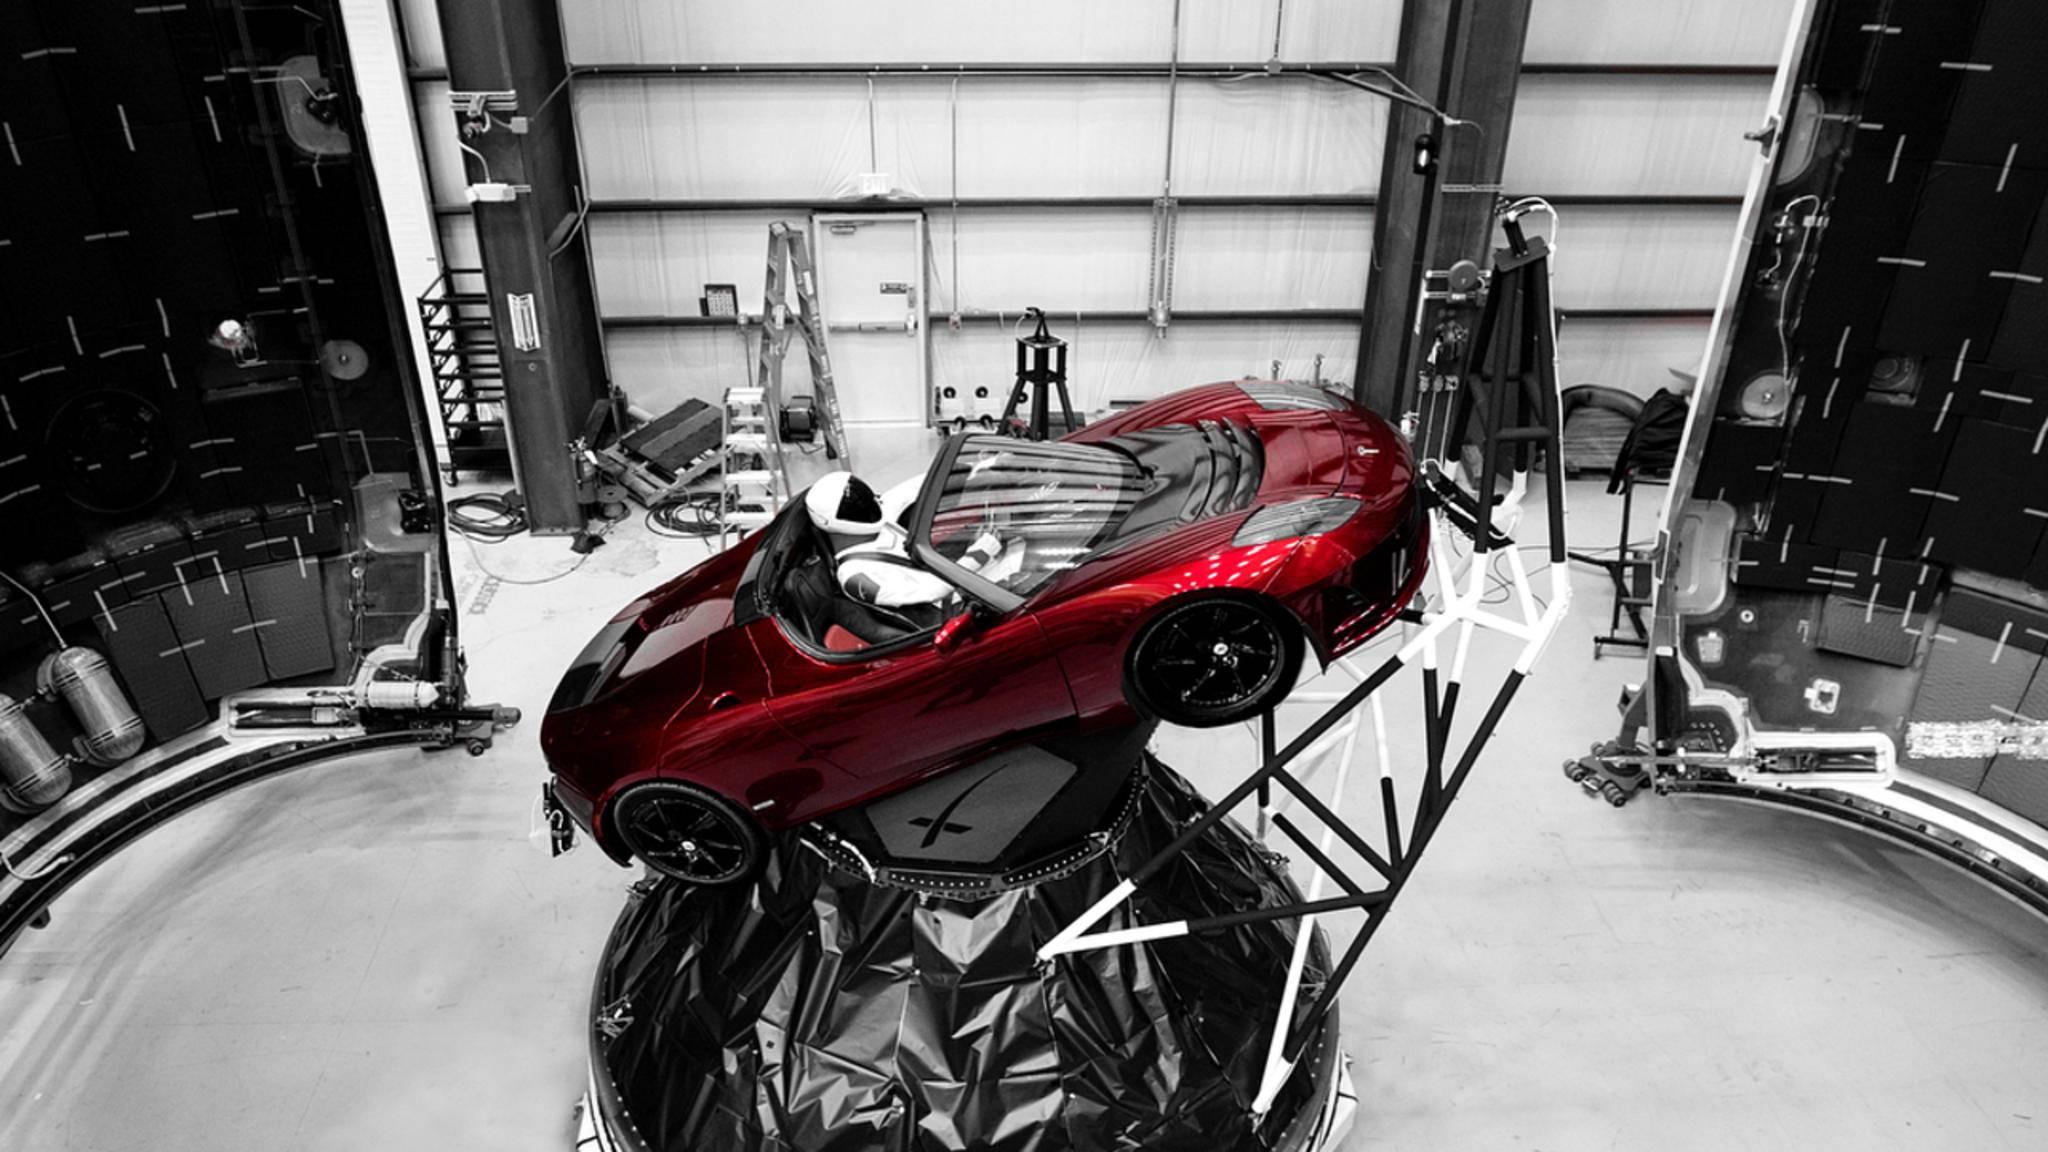 Tesla-Roadster in SpaceX-Rakete: Elon Musk enthüllt Easter Egg